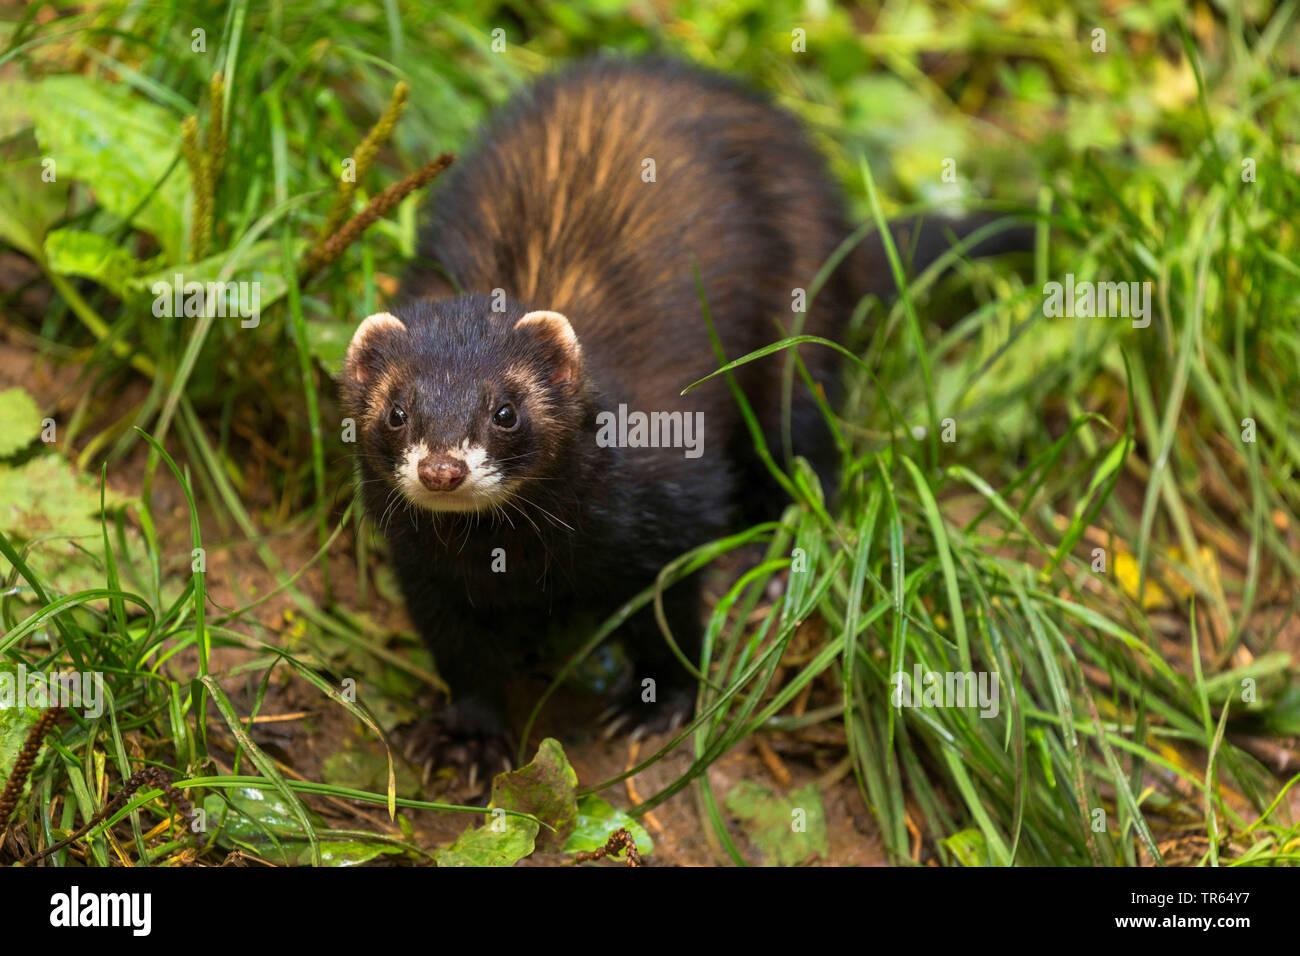 domestic polecat, domestic ferret (Mustela putorius f. furo, Mustela putorius furo), dark shape, front view, Germany, Bavaria - Stock Image